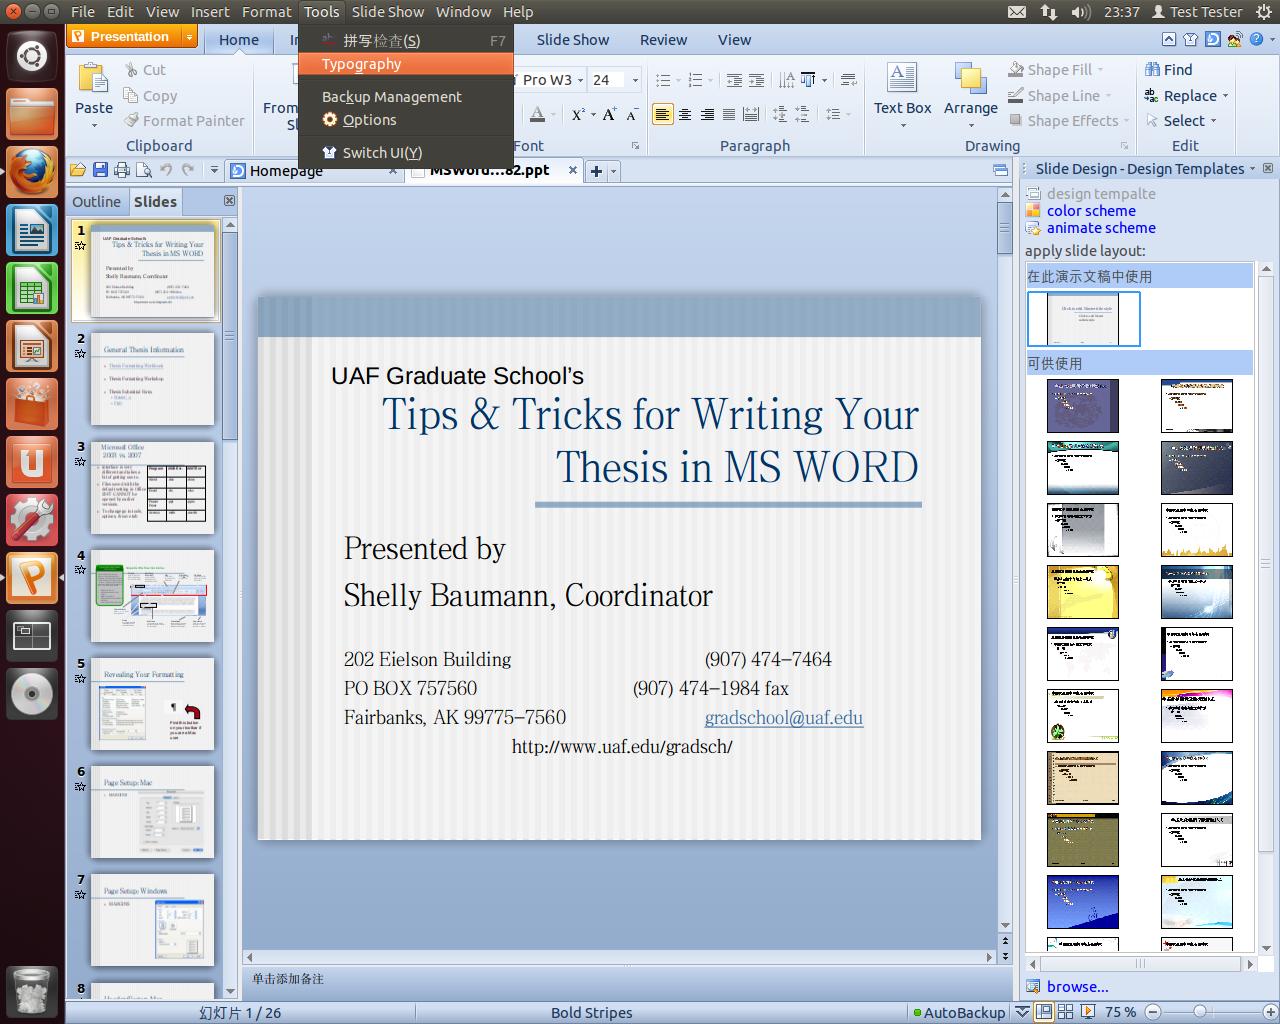 Feature Comparison: LibreOffice - Microsoft Office